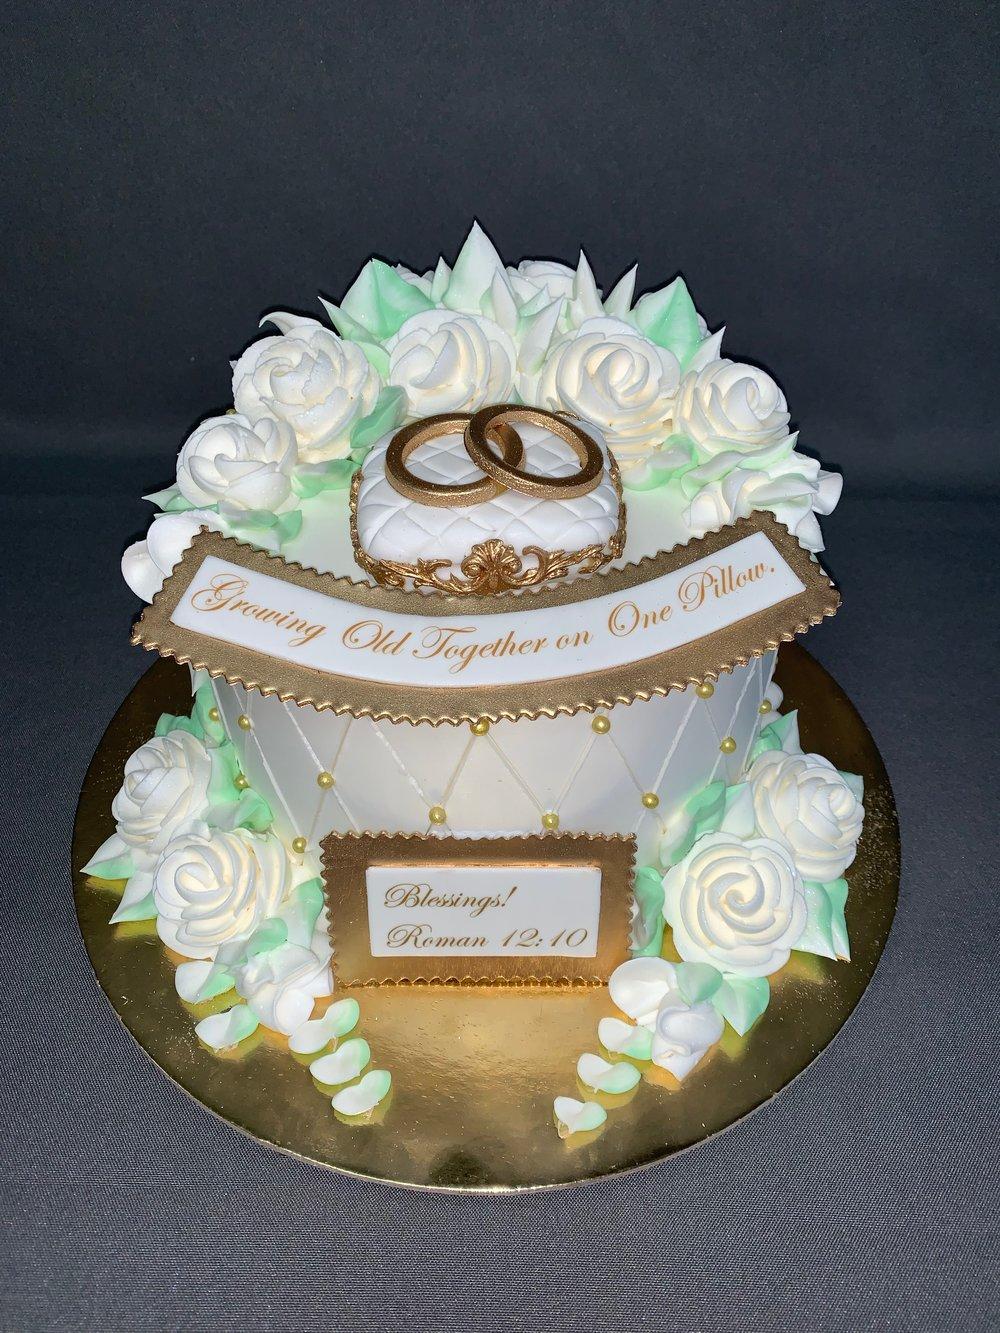 Bast Anniversary Cake NJ